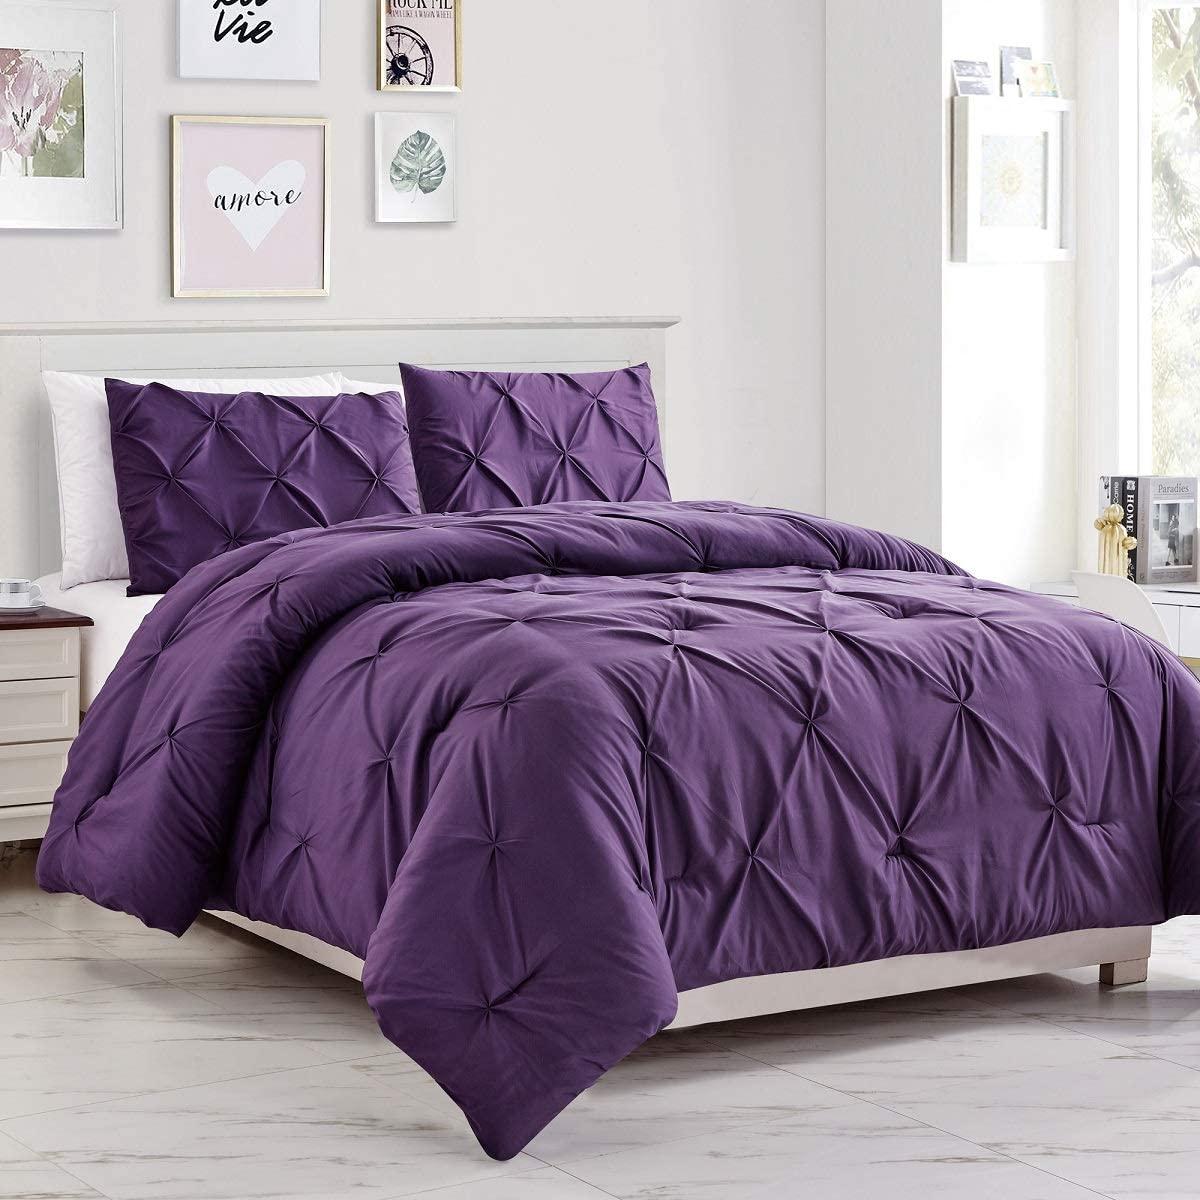 Wpm 3 Piece Microfiber Comforter Set Pinch Pleat Pintuck Down Alternative Bedding All Season Purple Bedroom Decor Jn1 Dark Purple World Products Mart